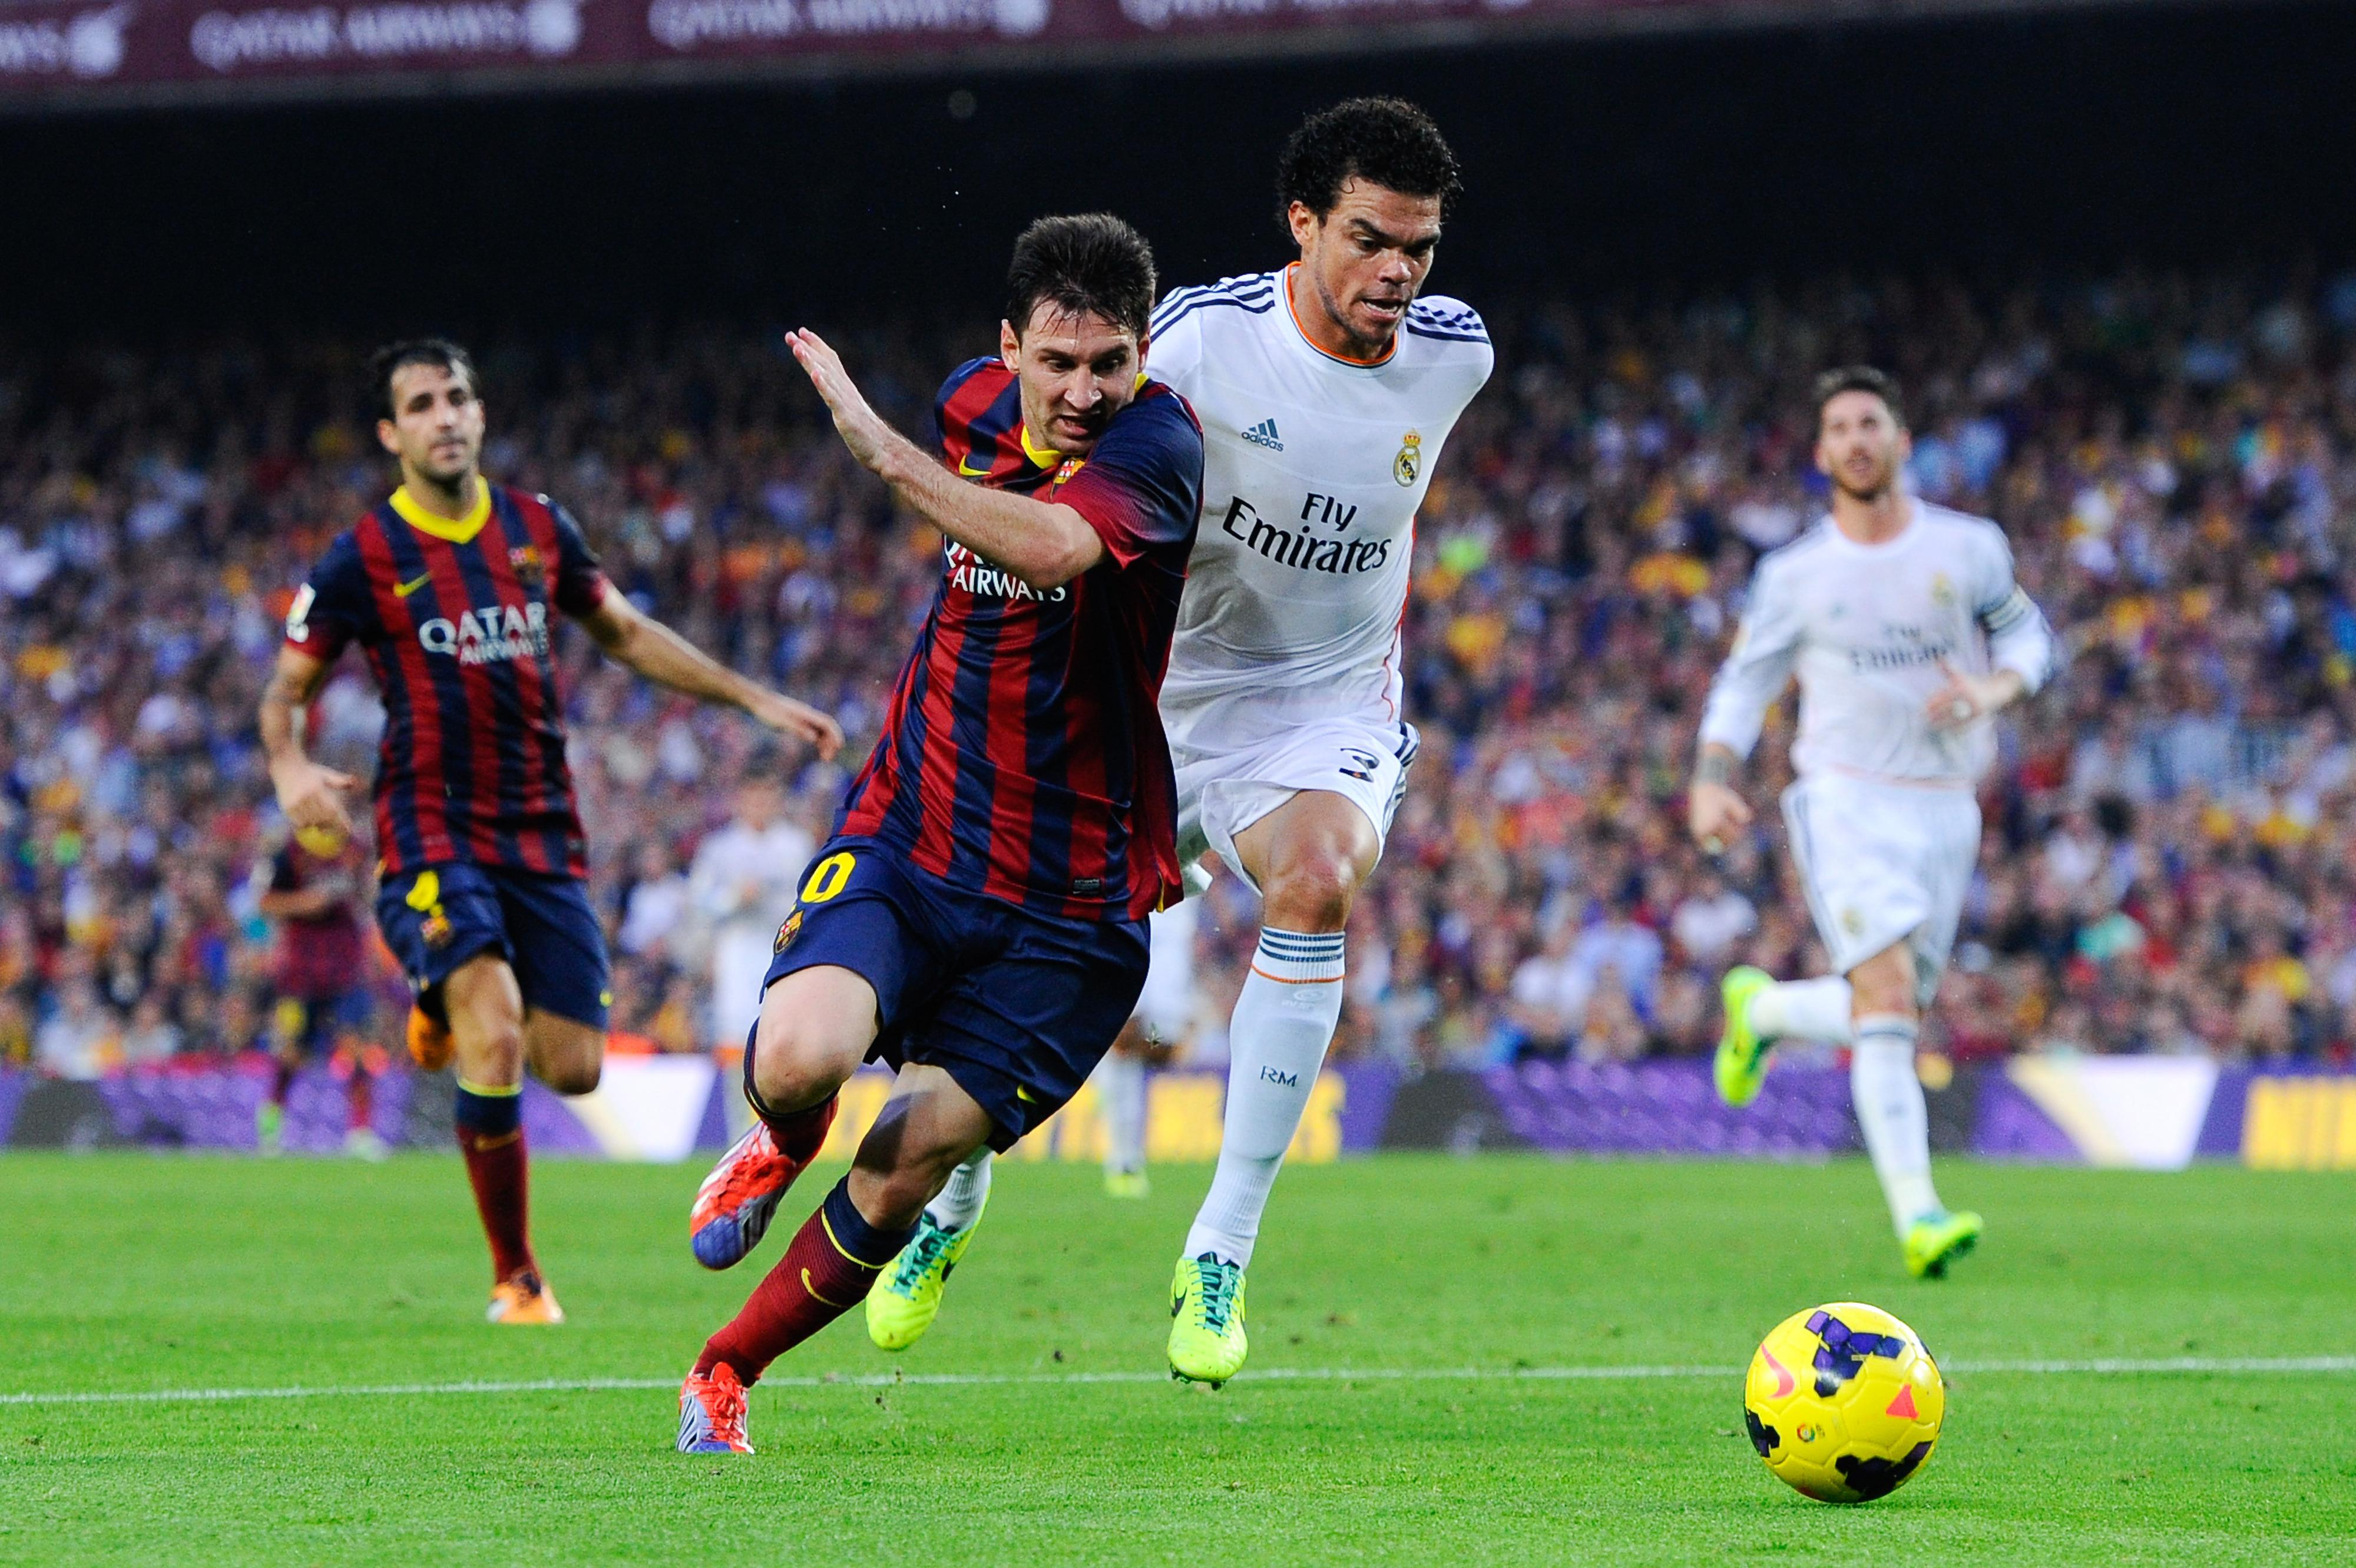 Real Madrid vs. Barcelona, El Clásico: A guide